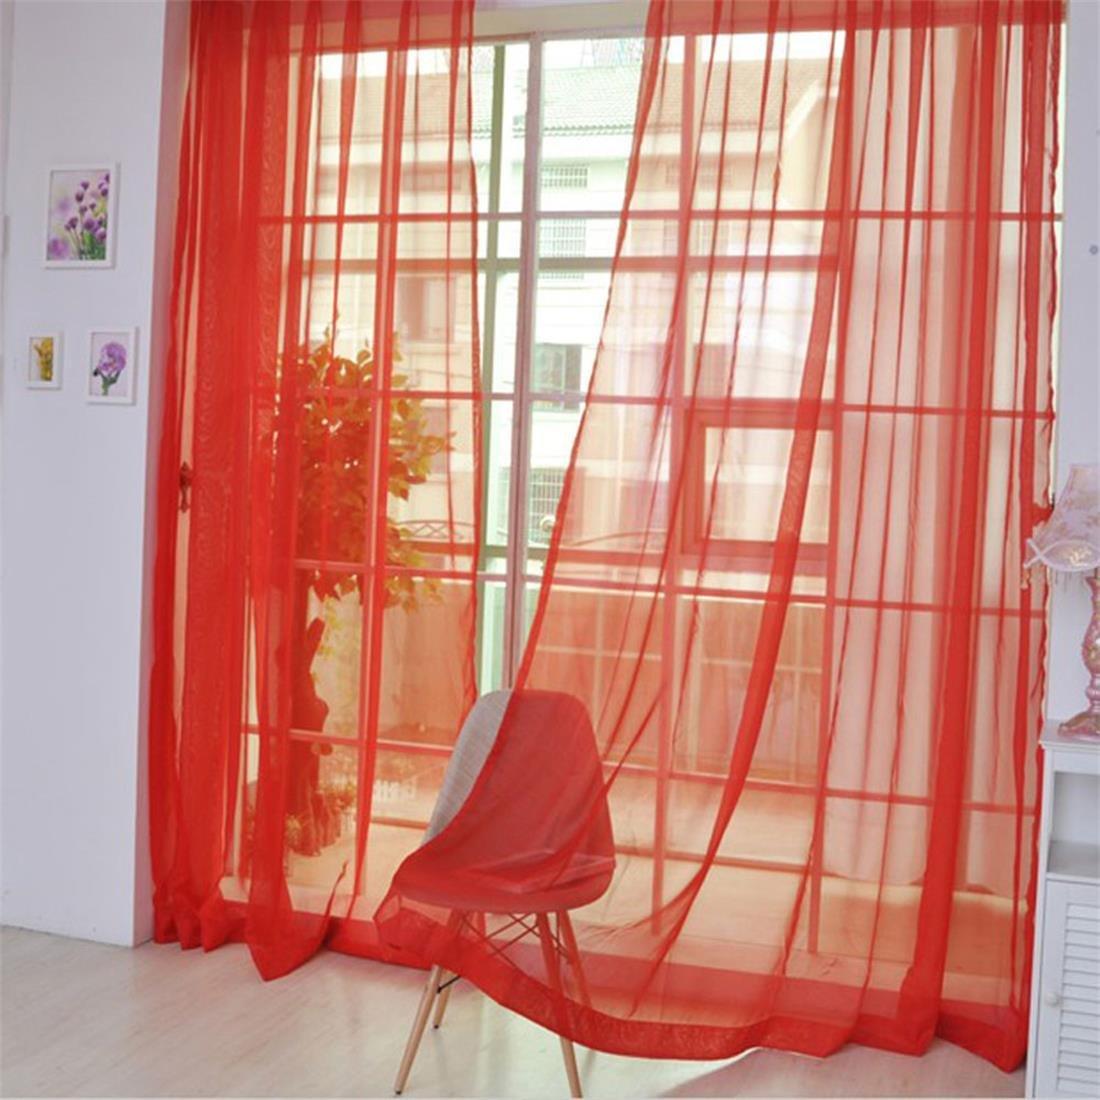 AFUT -Cortina de tul para puerta o ventana, 100 x 200 cm, color liso a la moda, café , 100x200cm 100x 200cm café